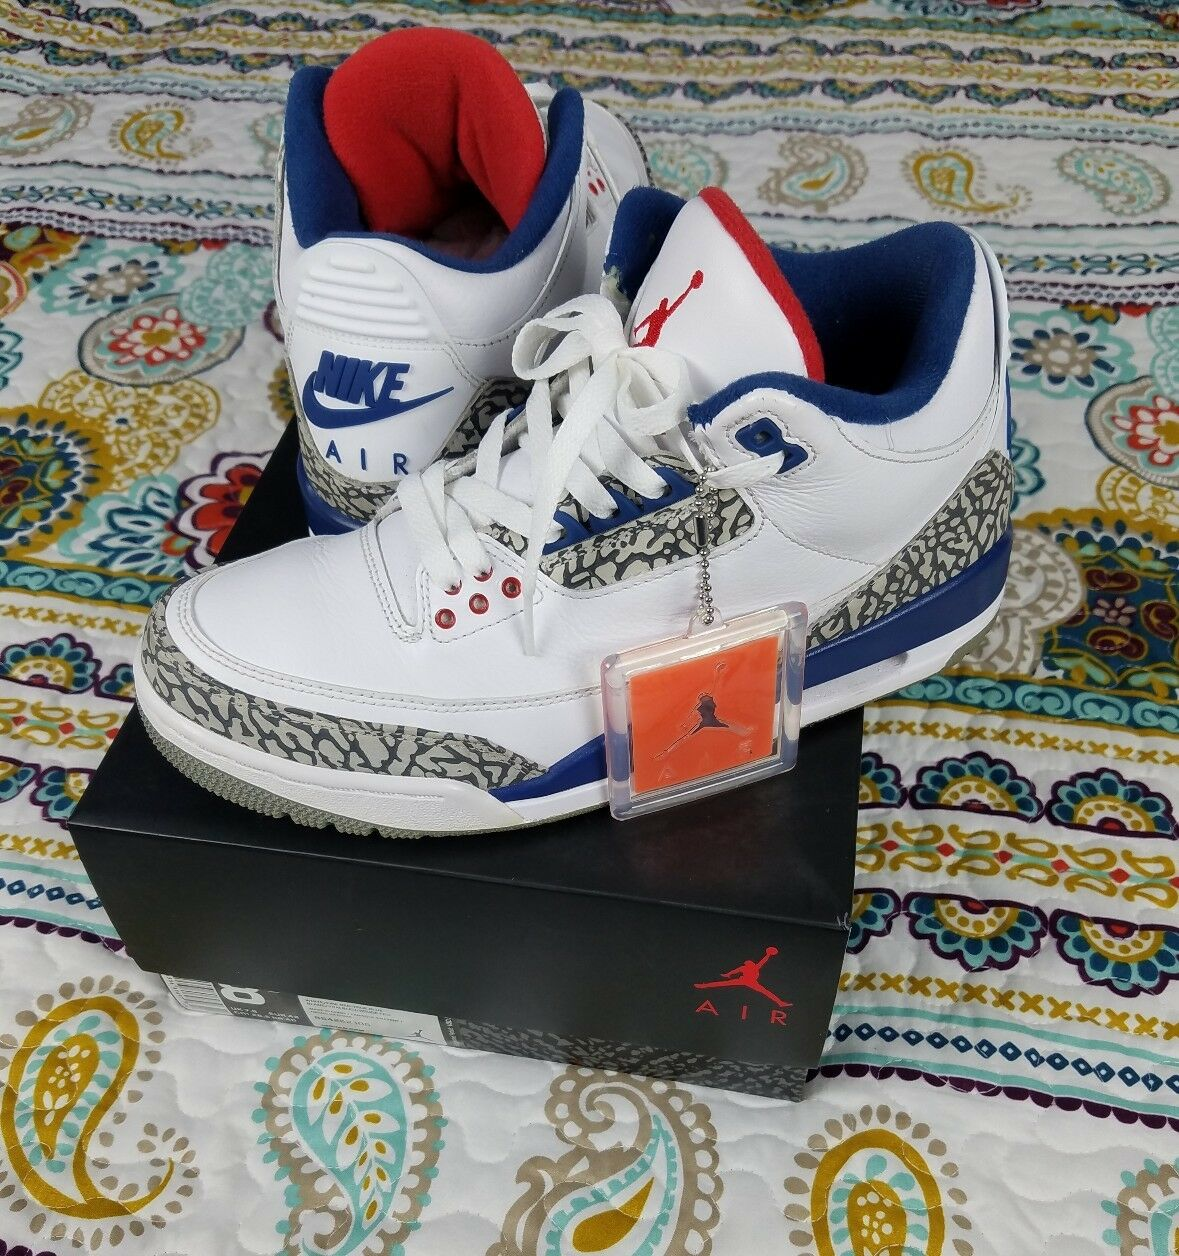 Nike Air Jordan OG Retro  True bluee  3 III Mens sz 8.5 Basketball shoes Sneakers